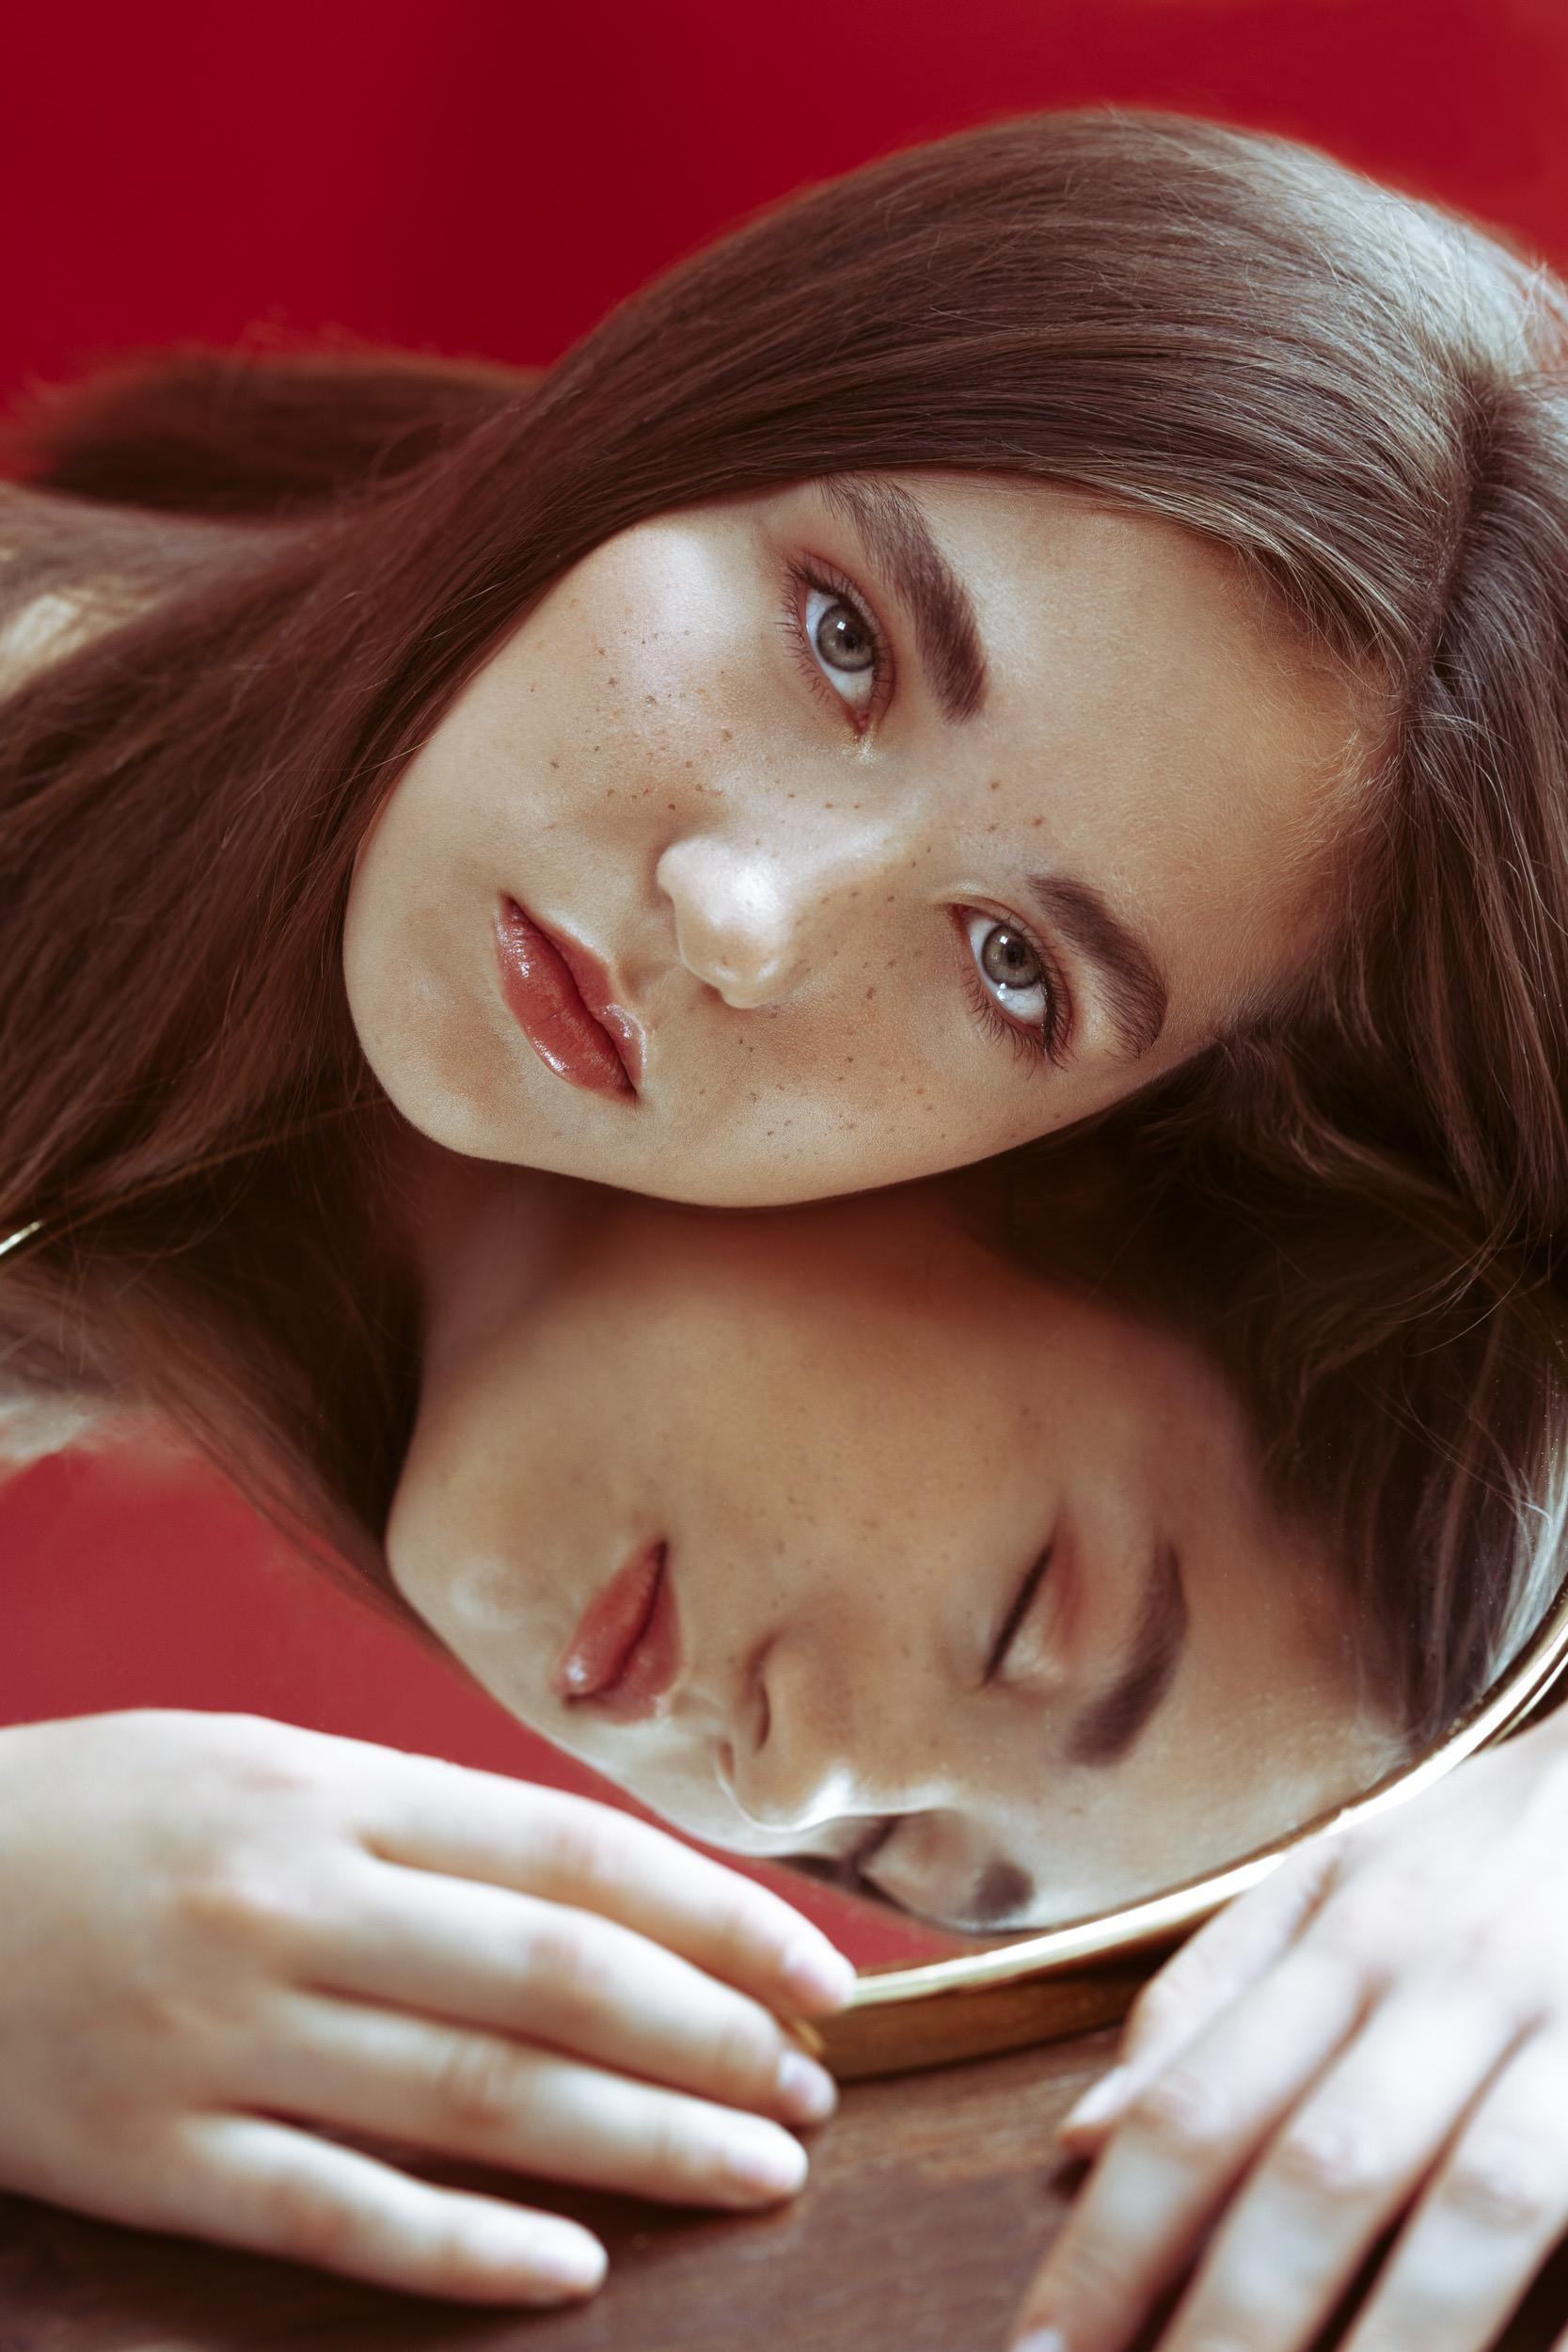 Beauty Photography by Jill Abanico